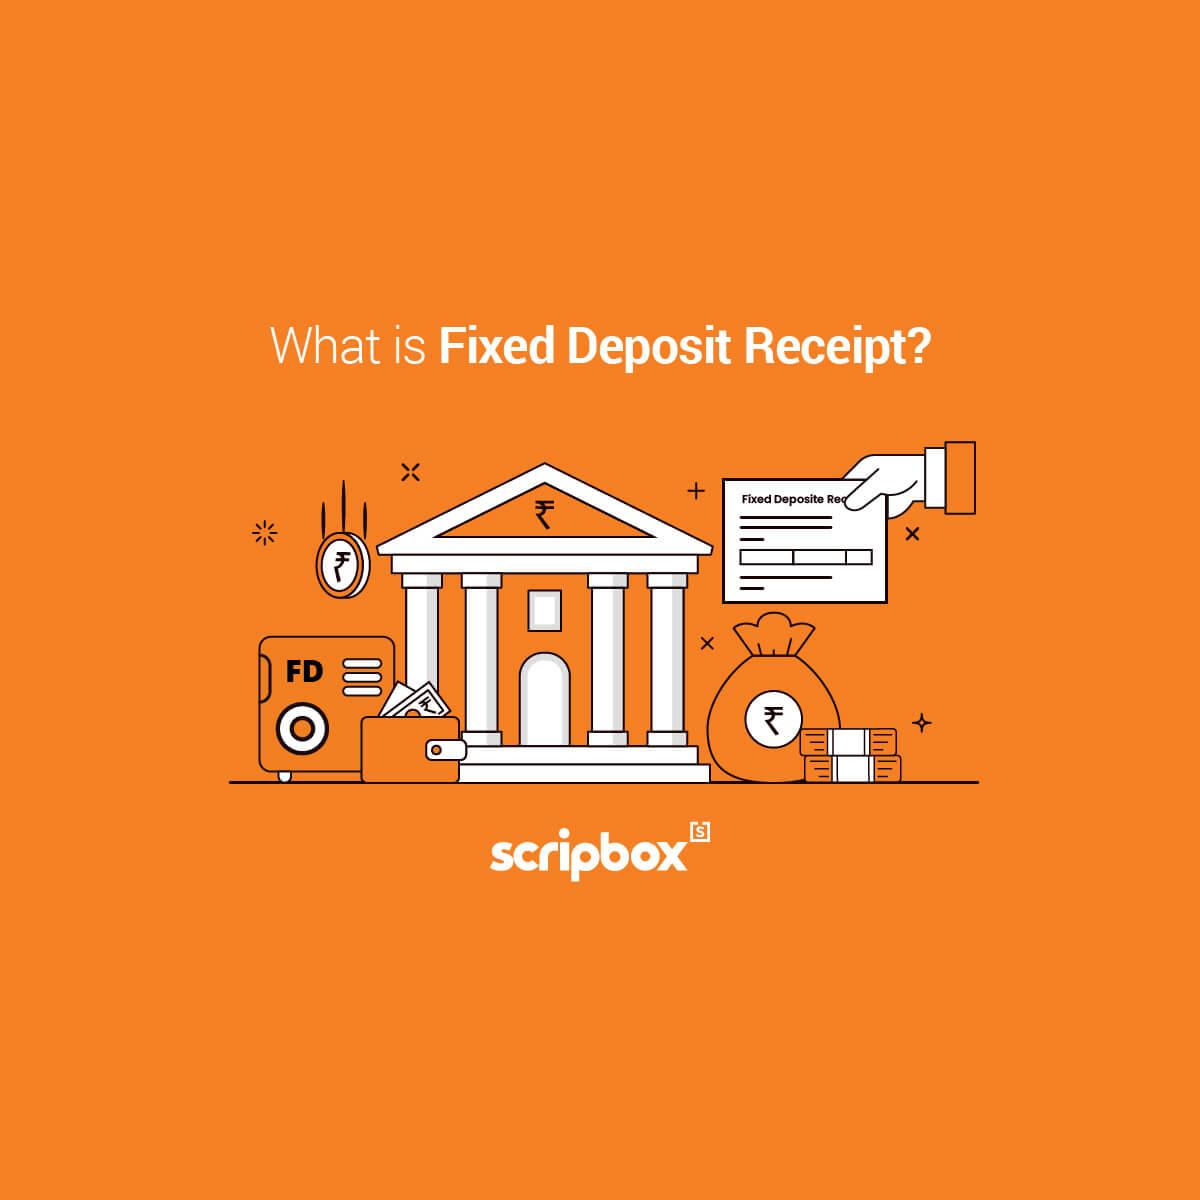 fixed deposit receipt